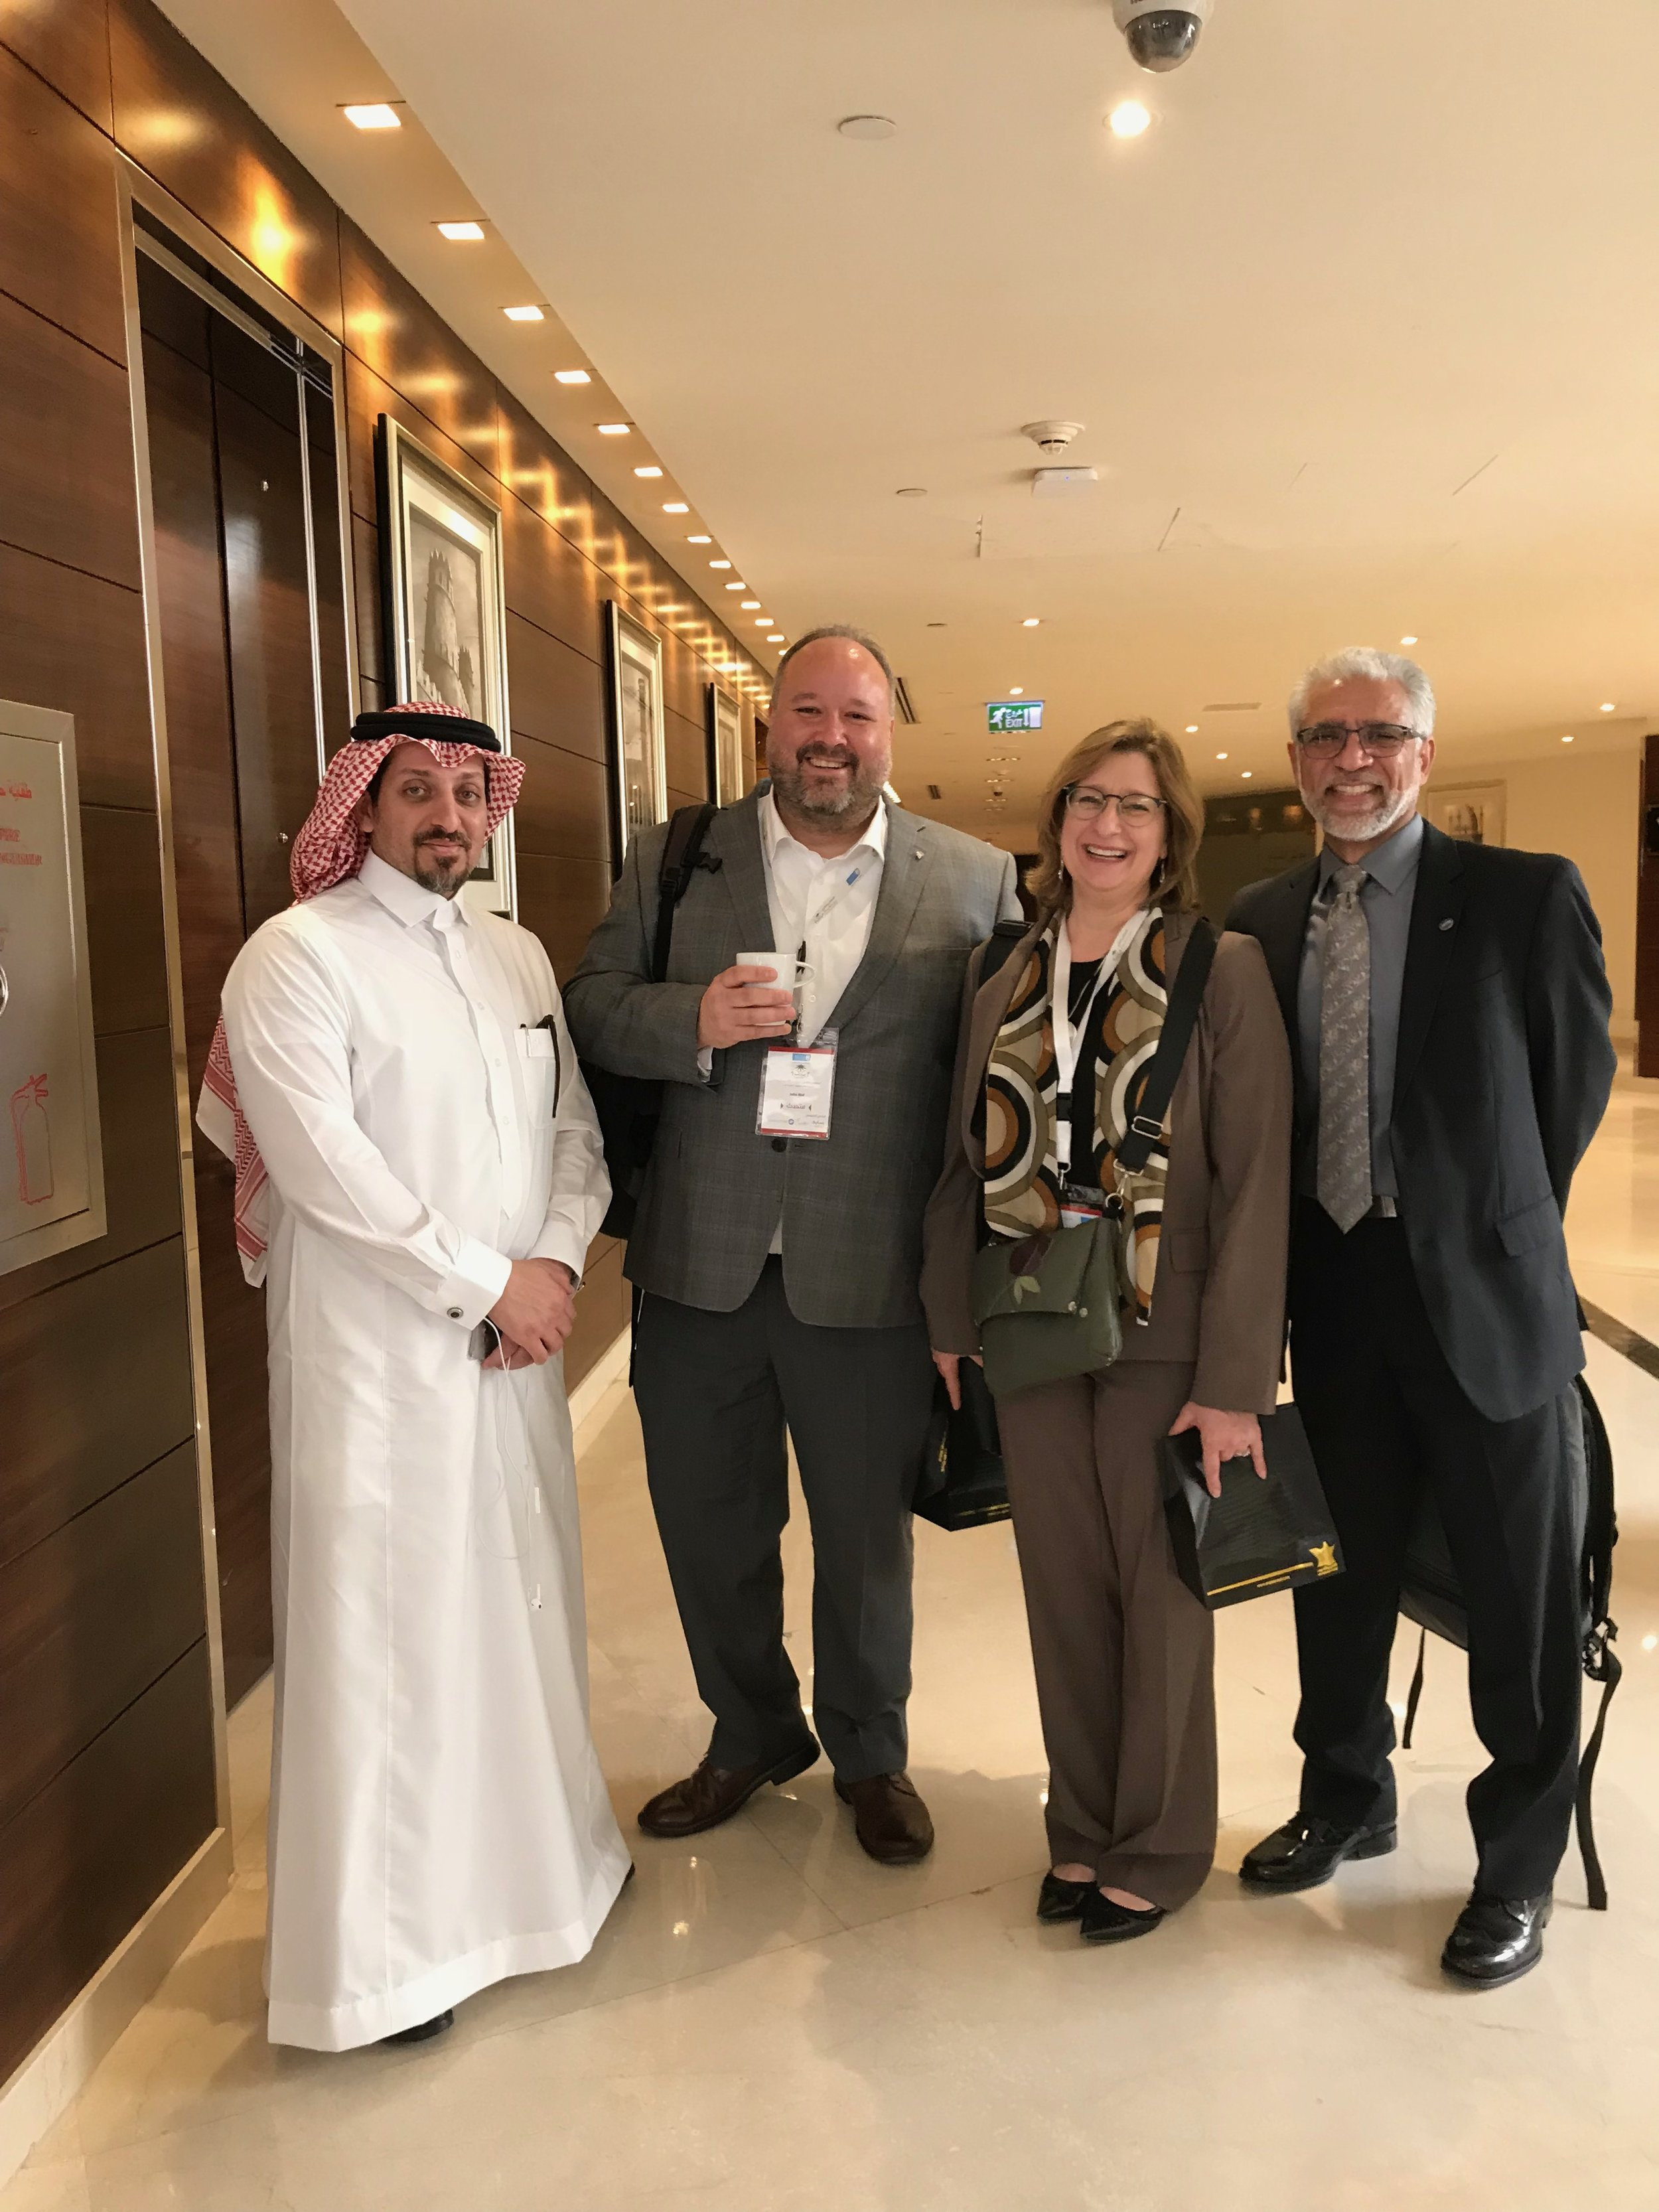 Yahya Al-Harthi, John Bial, Kristin, and Arun